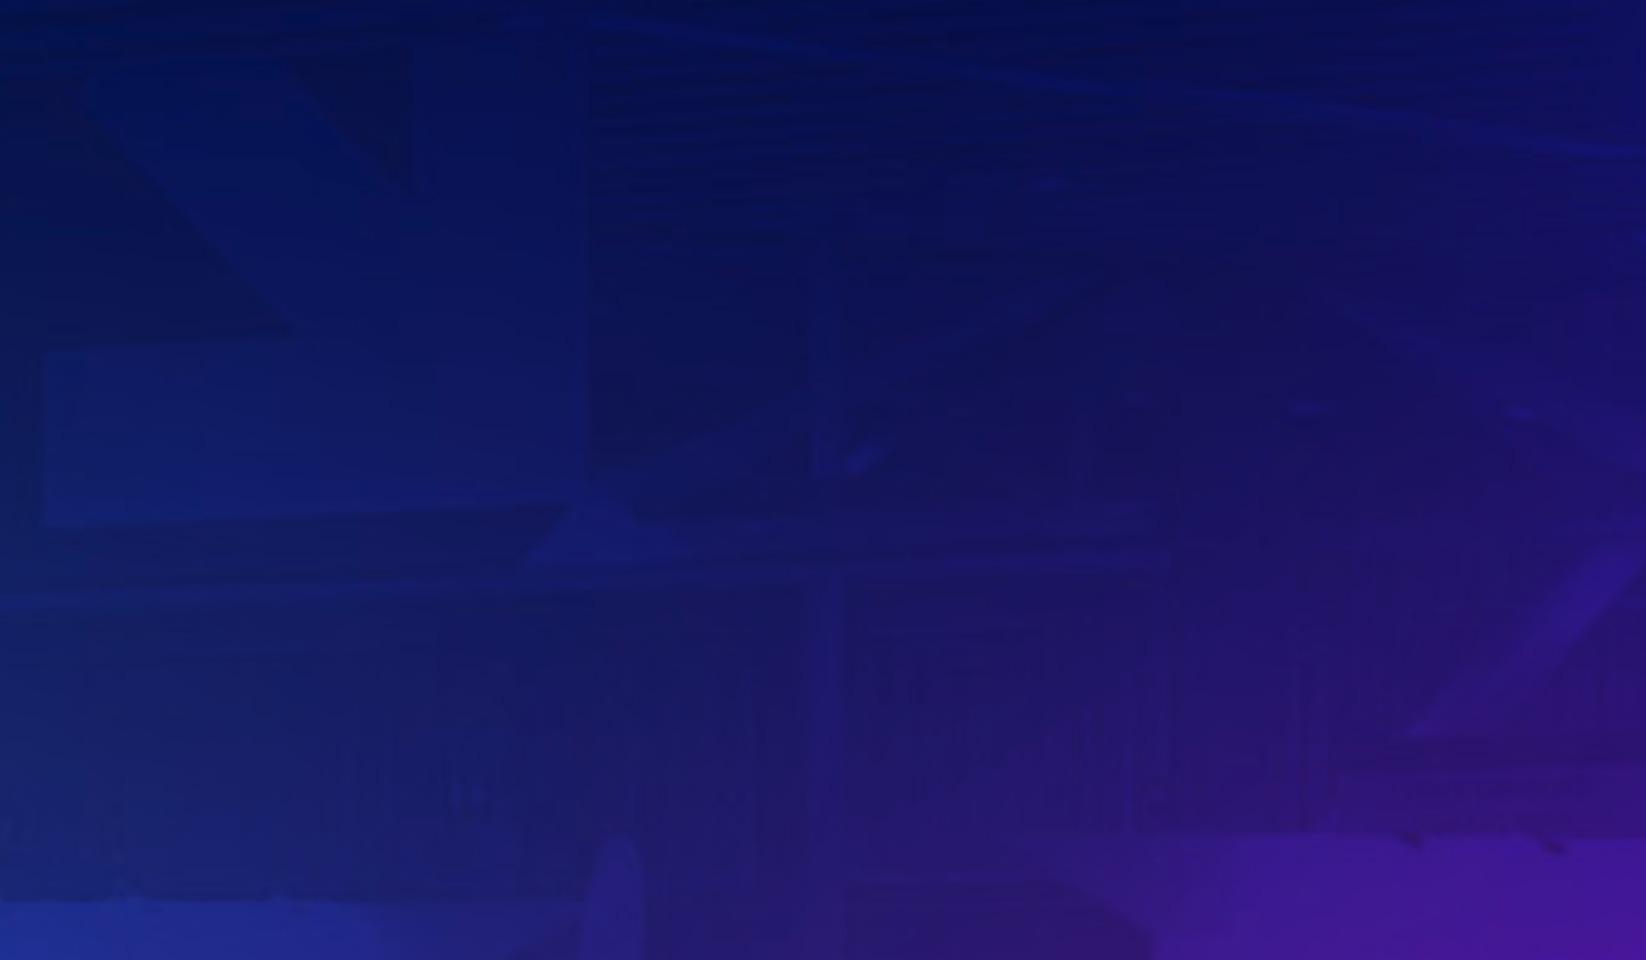 fond d'ecran bleu